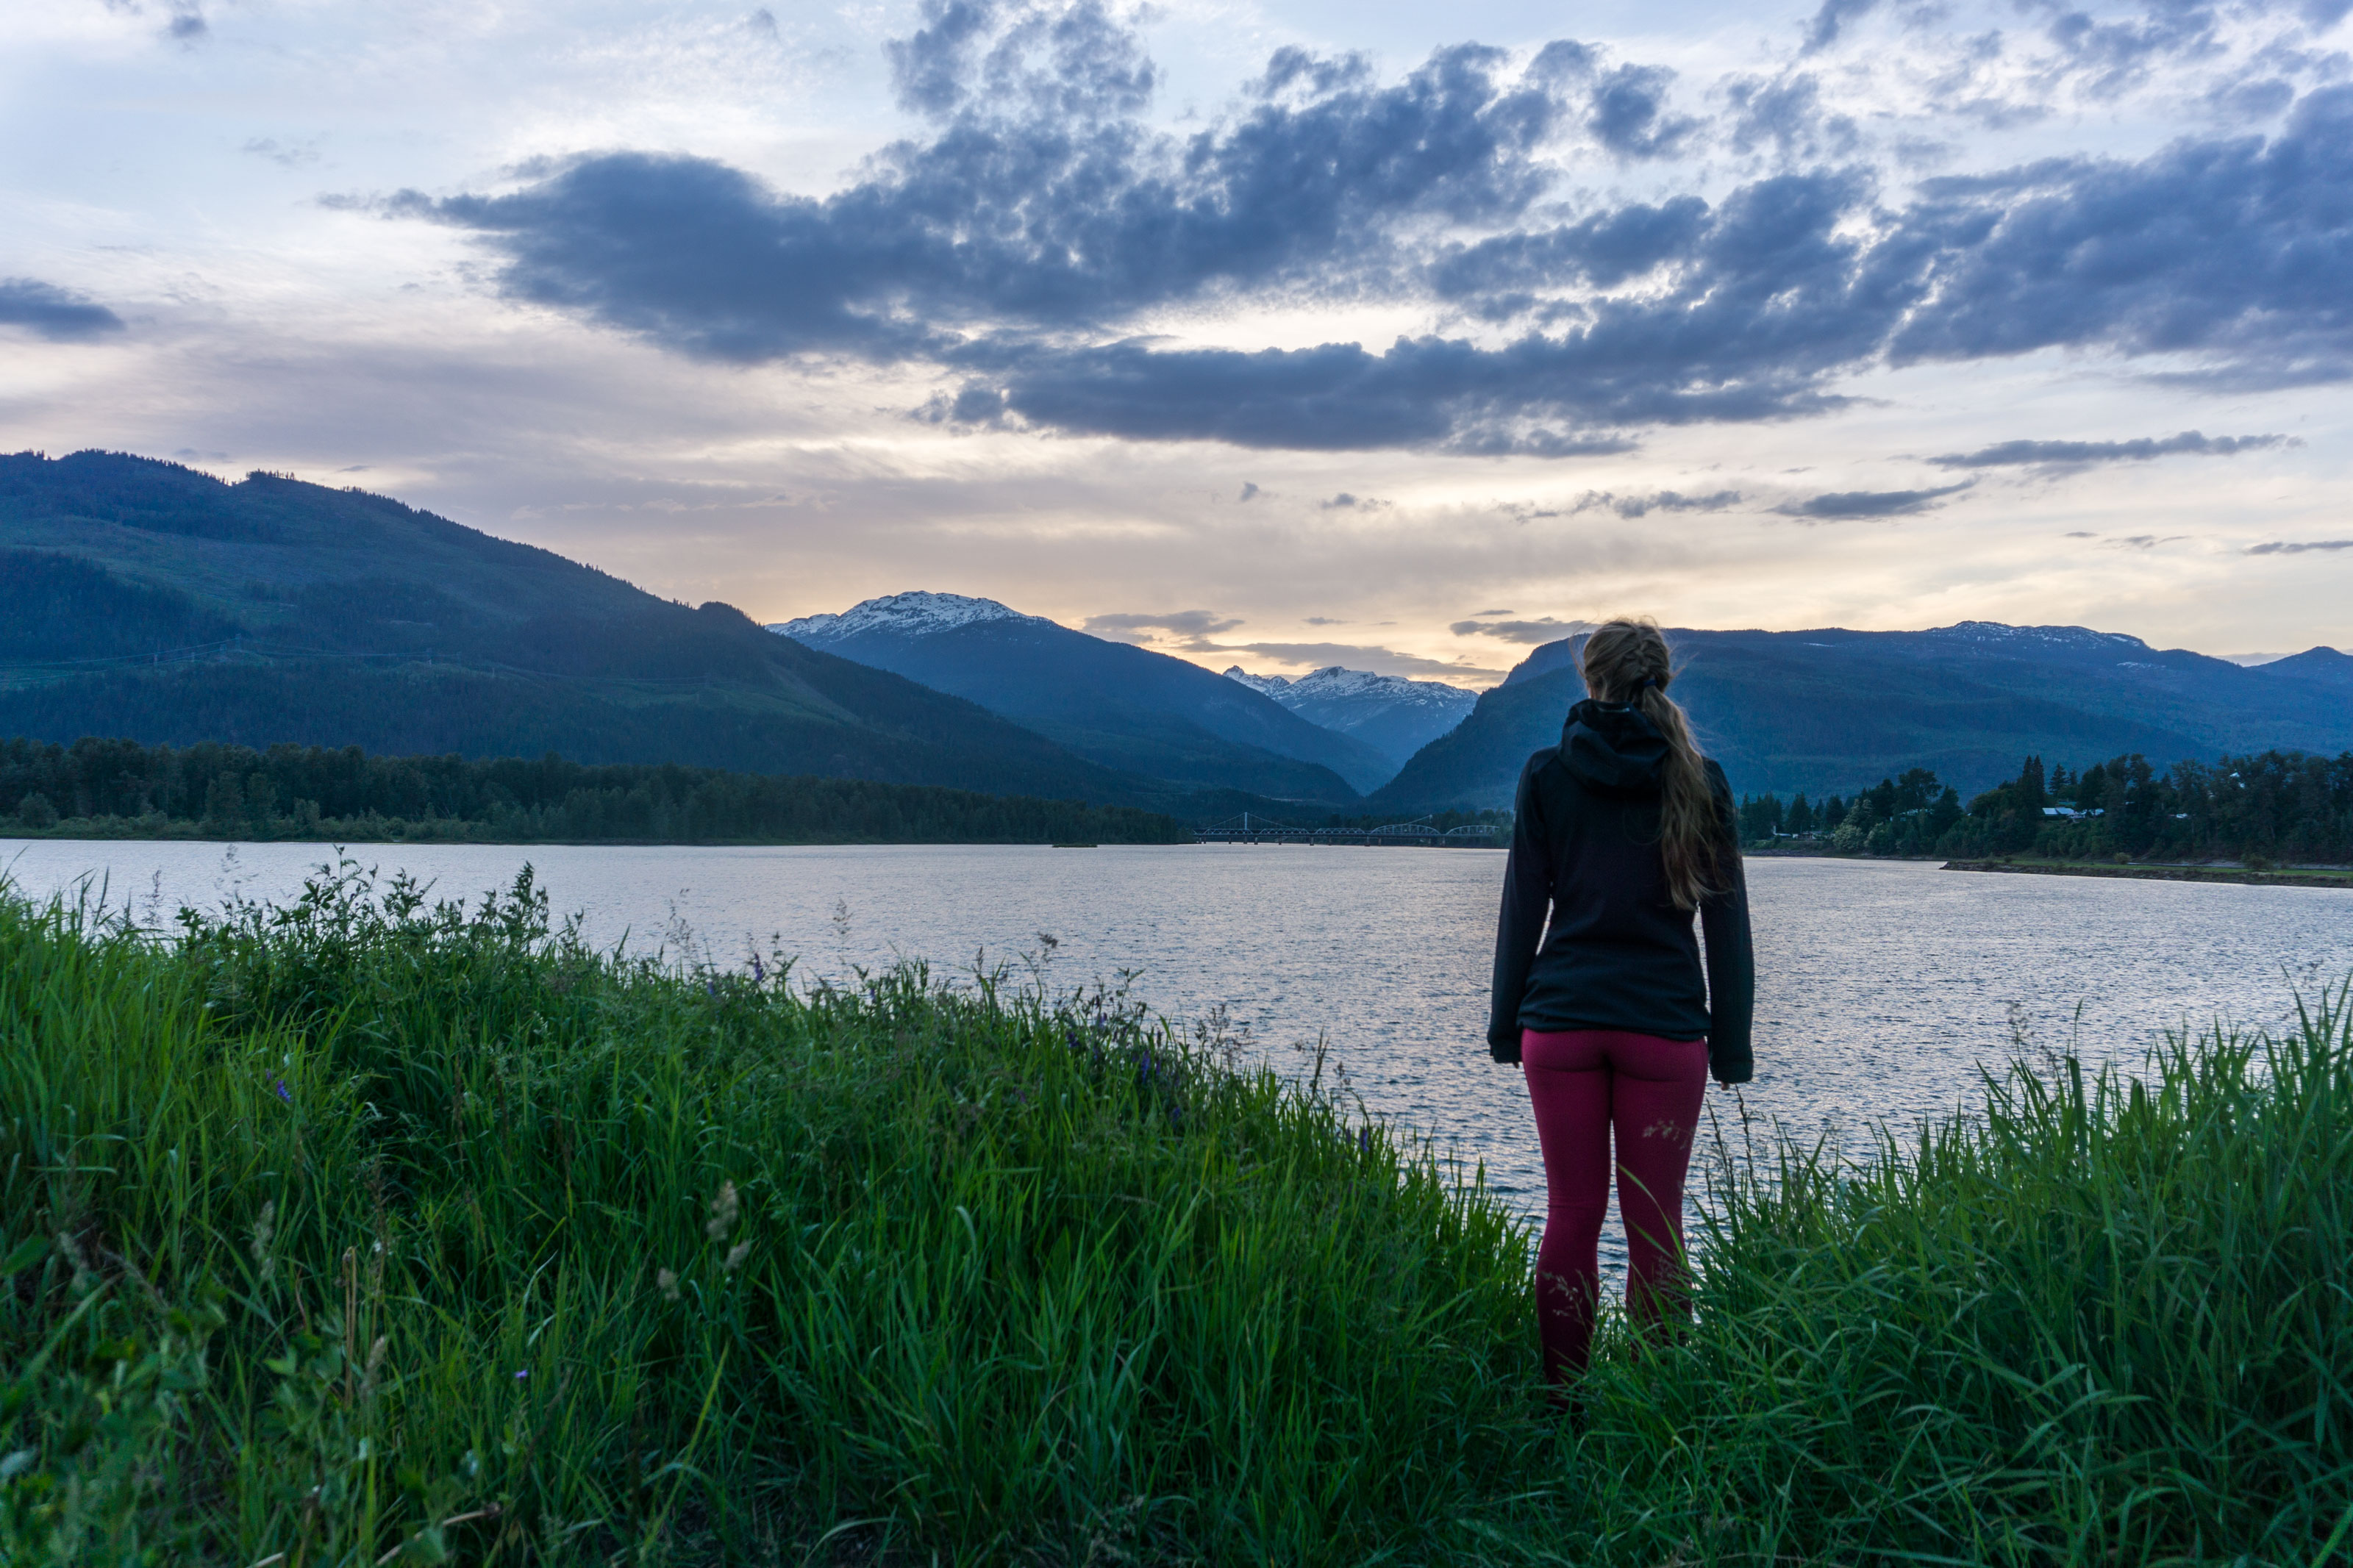 Zastávka nad Kamloops Lake a západ slunce nad Arrow Lake